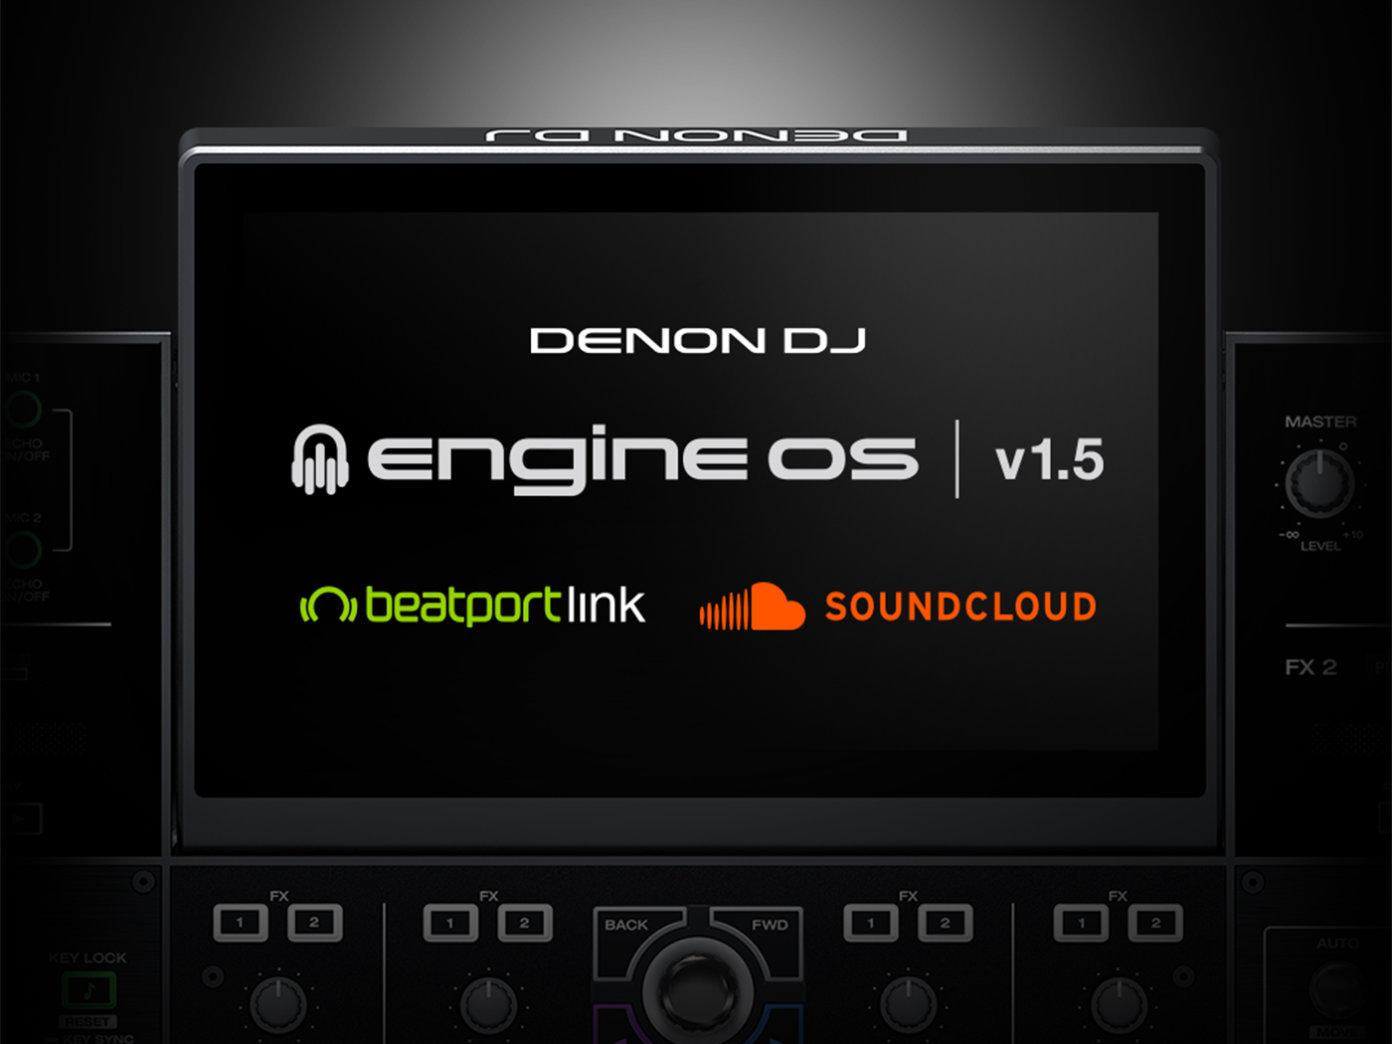 New Denon DJ Software Streams Beatport & SoundCloud Straight from the Decks